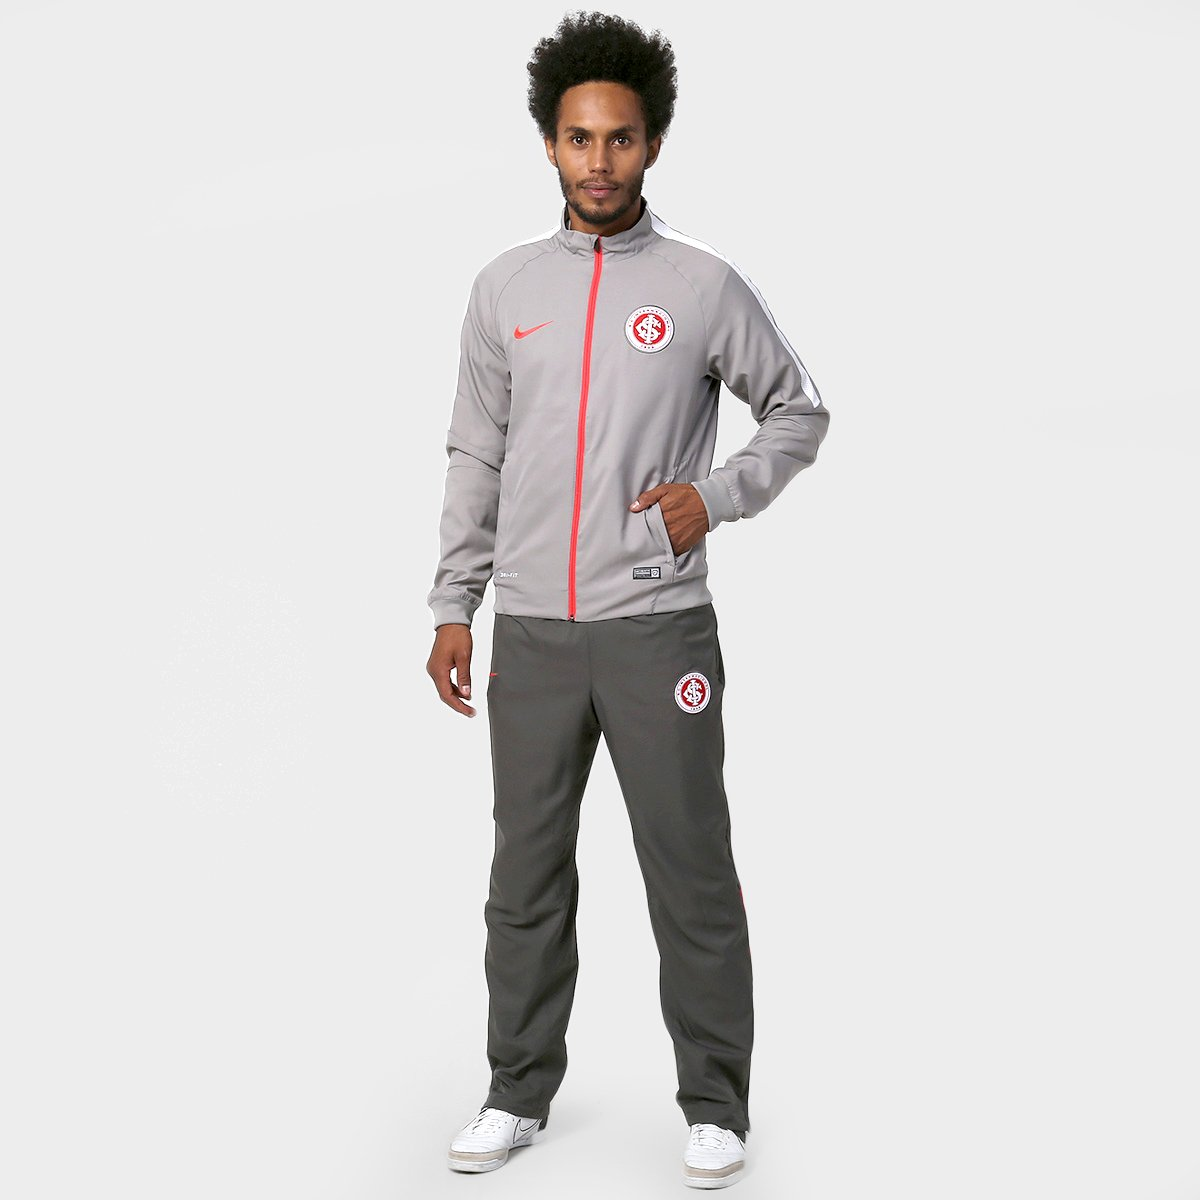 70ca860af6b Agasalho Nike Internacional Squad Sideline Woven - Compre Agora ...